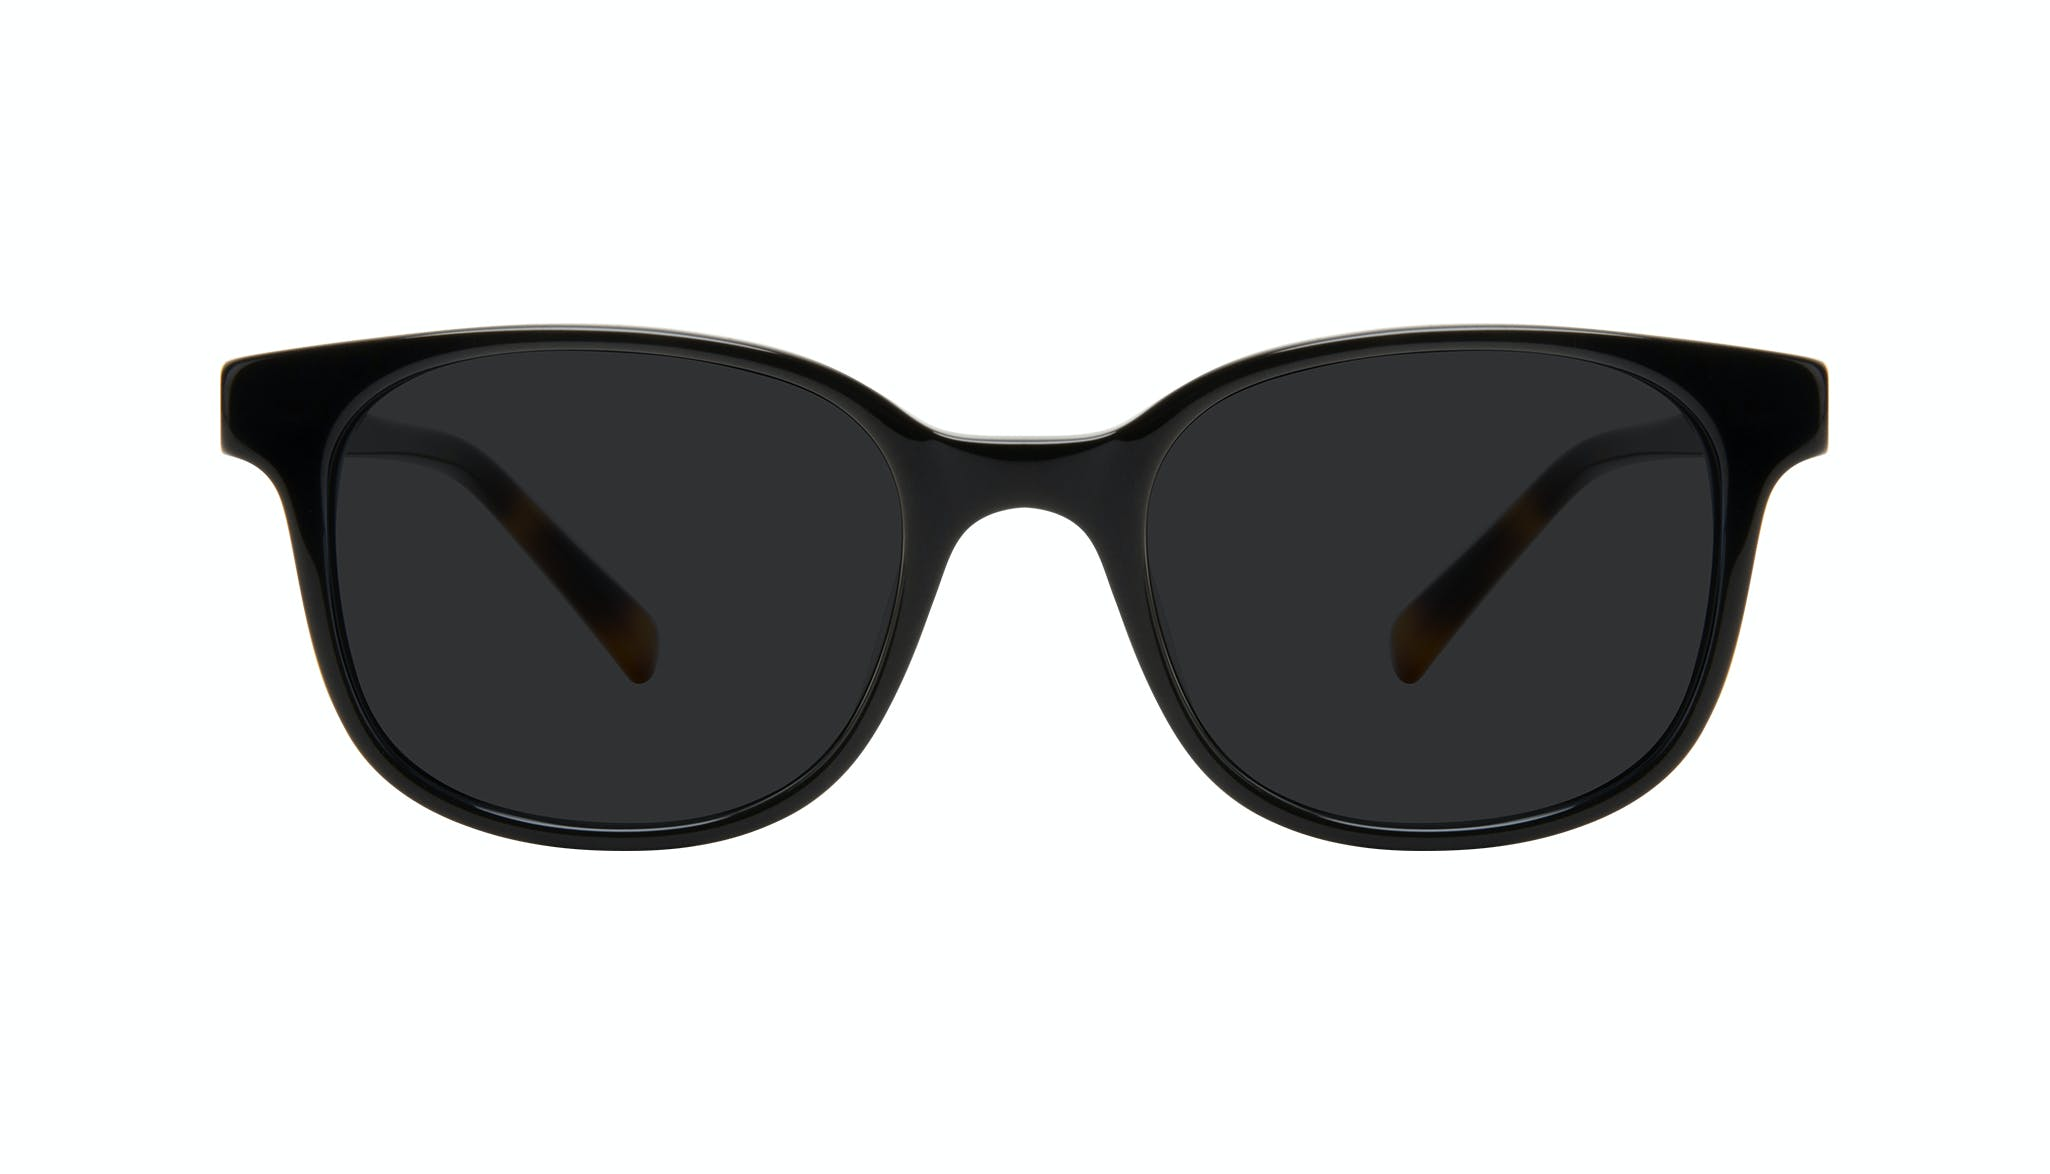 Affordable Fashion Glasses Square Eyeglasses Women Unique Onyx